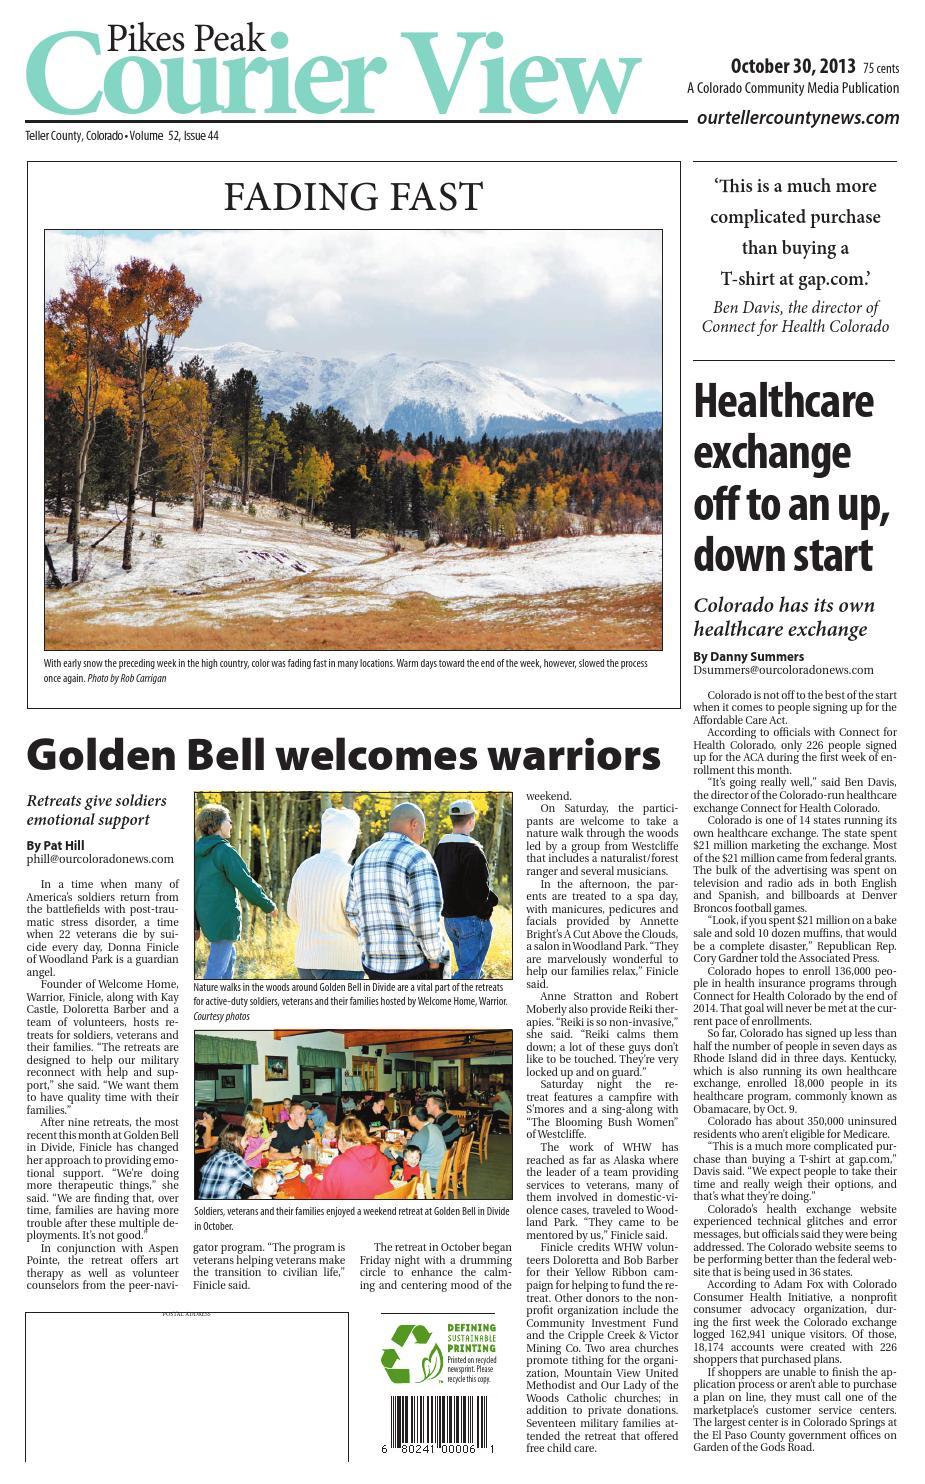 Spr303274che Weihnachten.Pikes Peak Courier View 1030 By Colorado Community Media Issuu